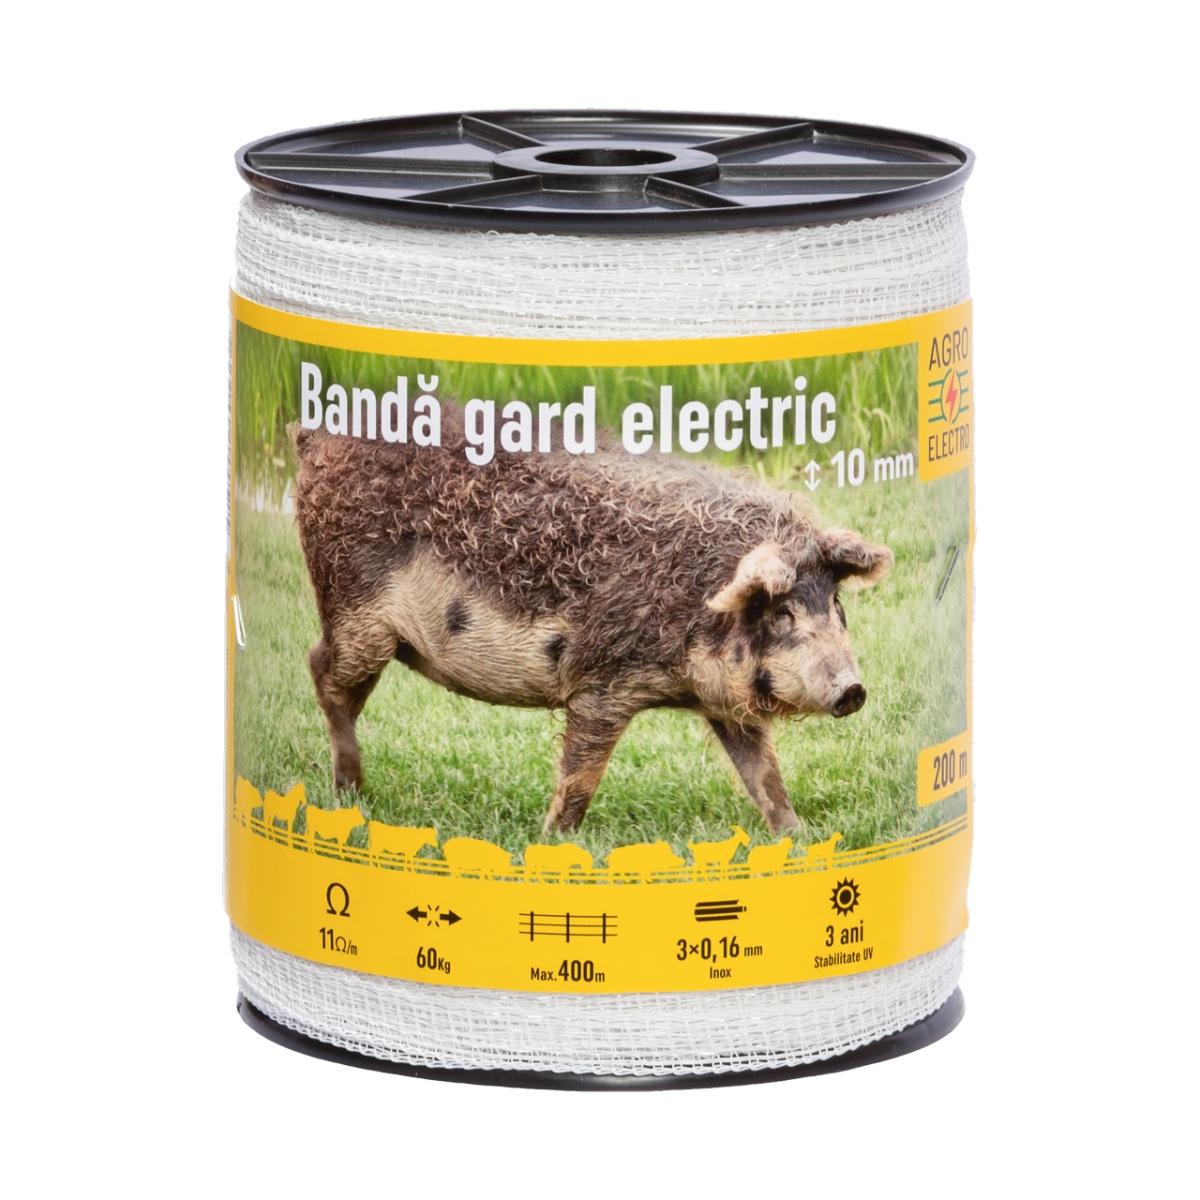 Bandă gard electric - 10 mm - 200m - 60kg - 11Ω/m